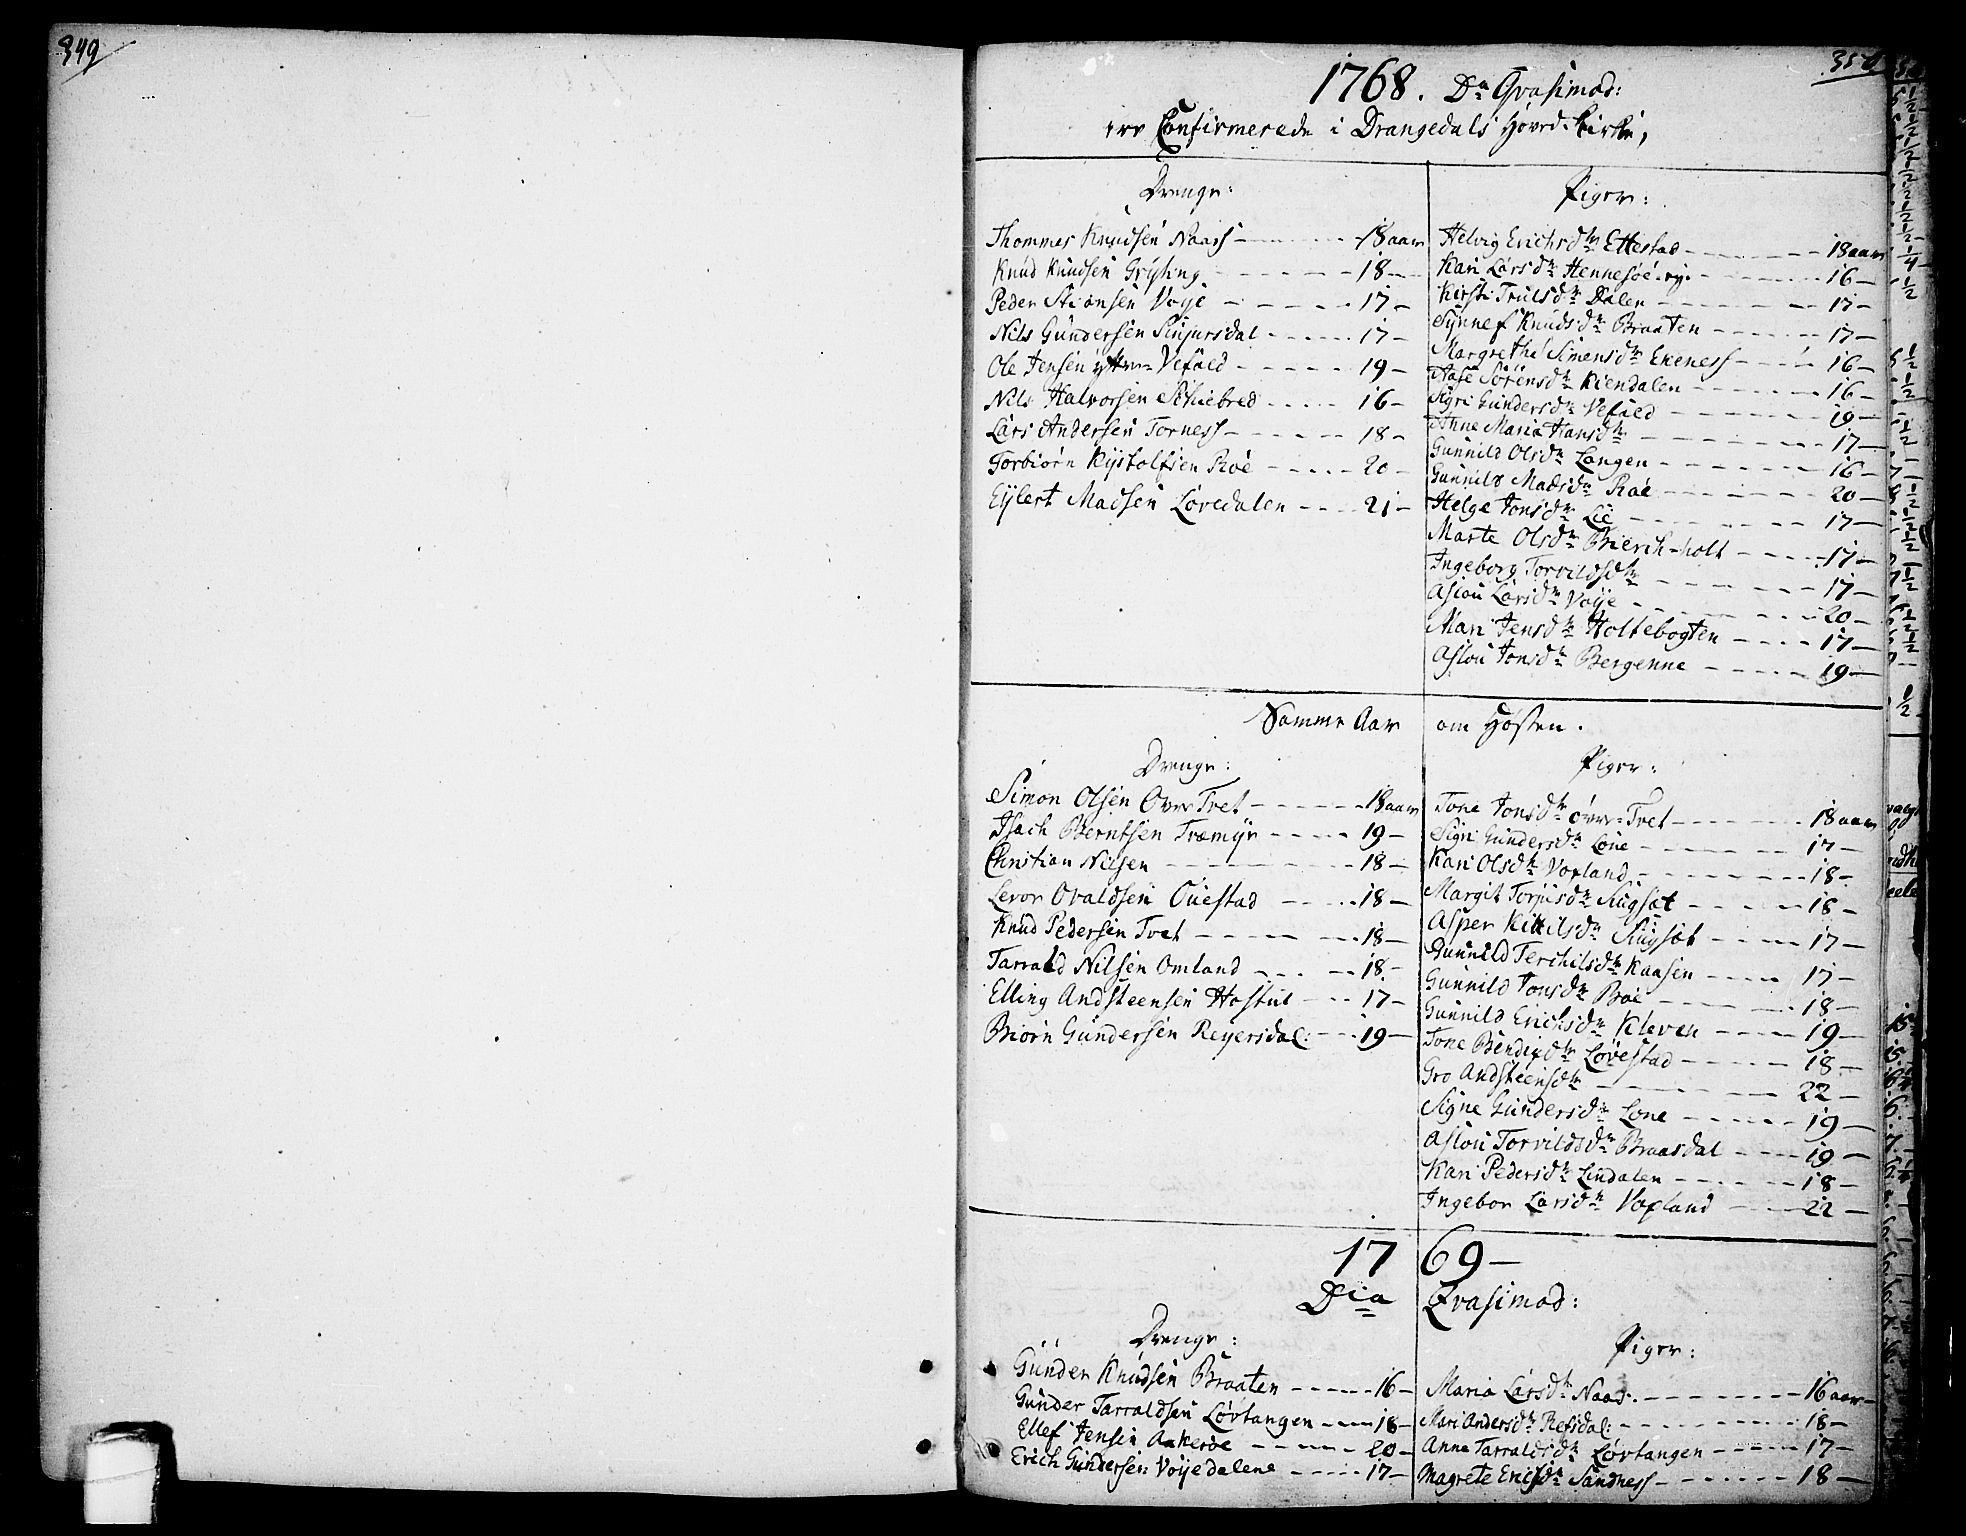 SAKO, Drangedal kirkebøker, F/Fa/L0003: Ministerialbok nr. 3, 1768-1814, s. 349-350